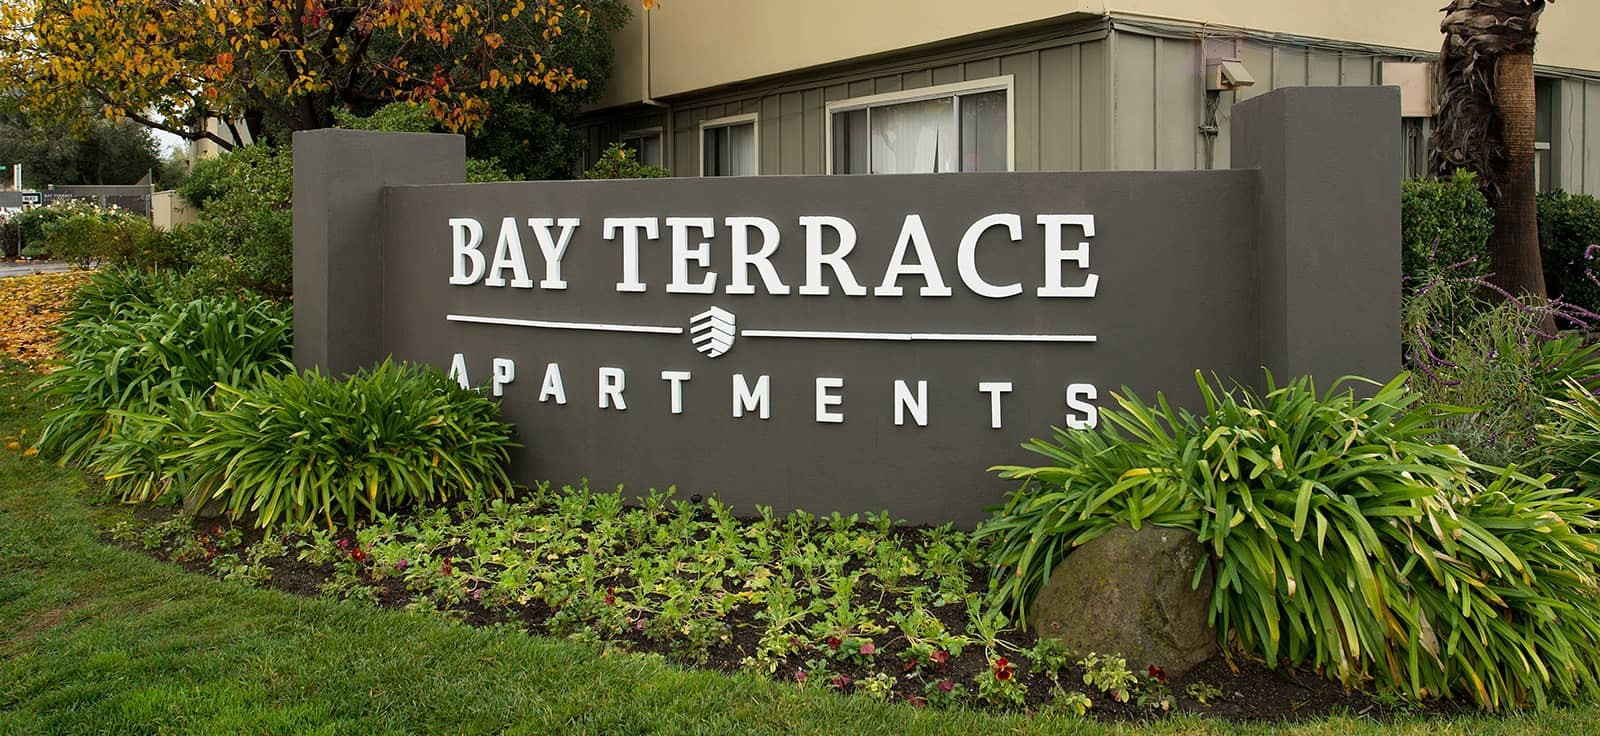 Bay Terrace Apartments San Mateo